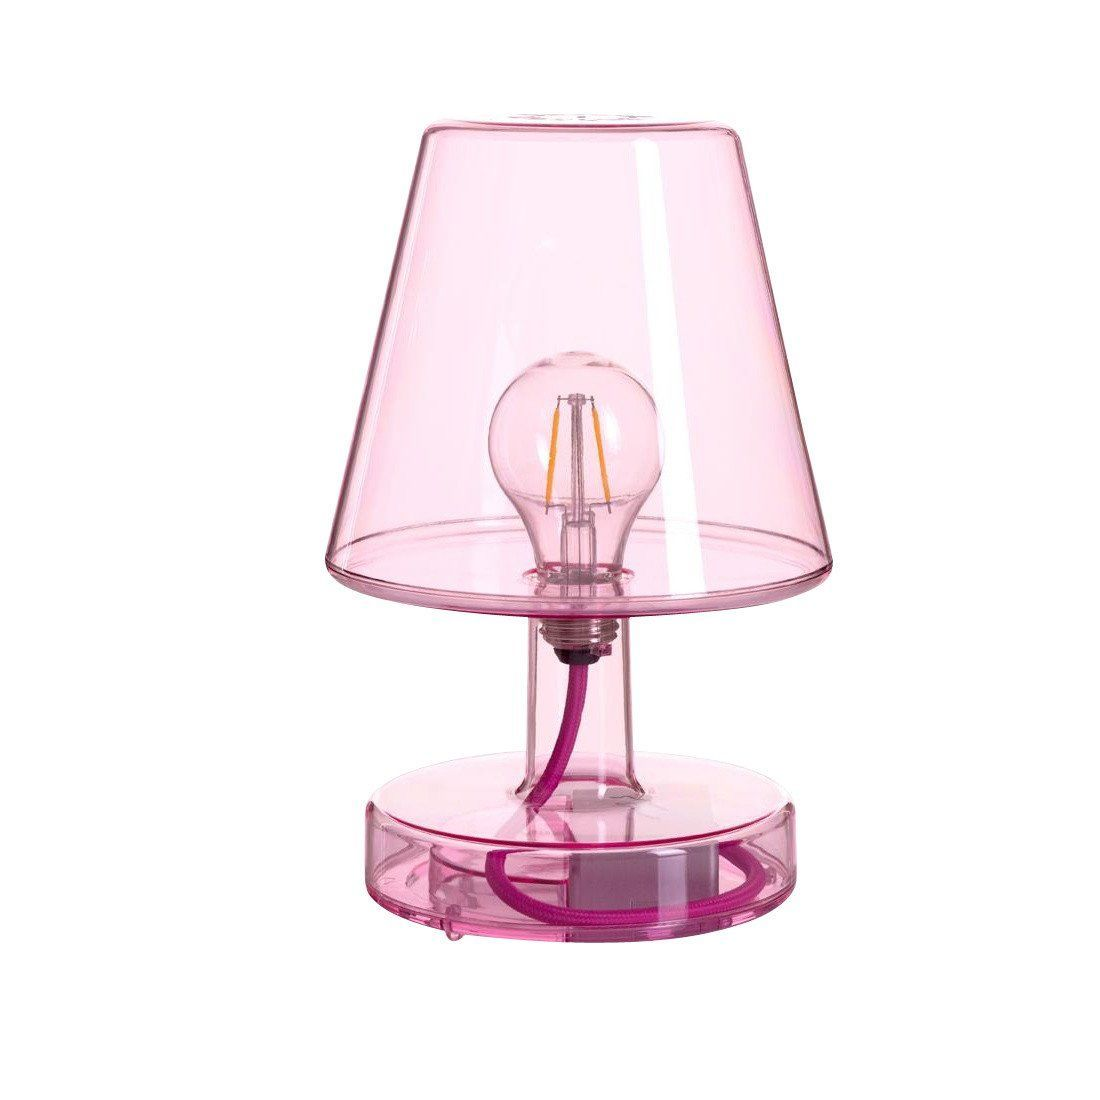 Fatboy Transloetje - Lampe De Table LED